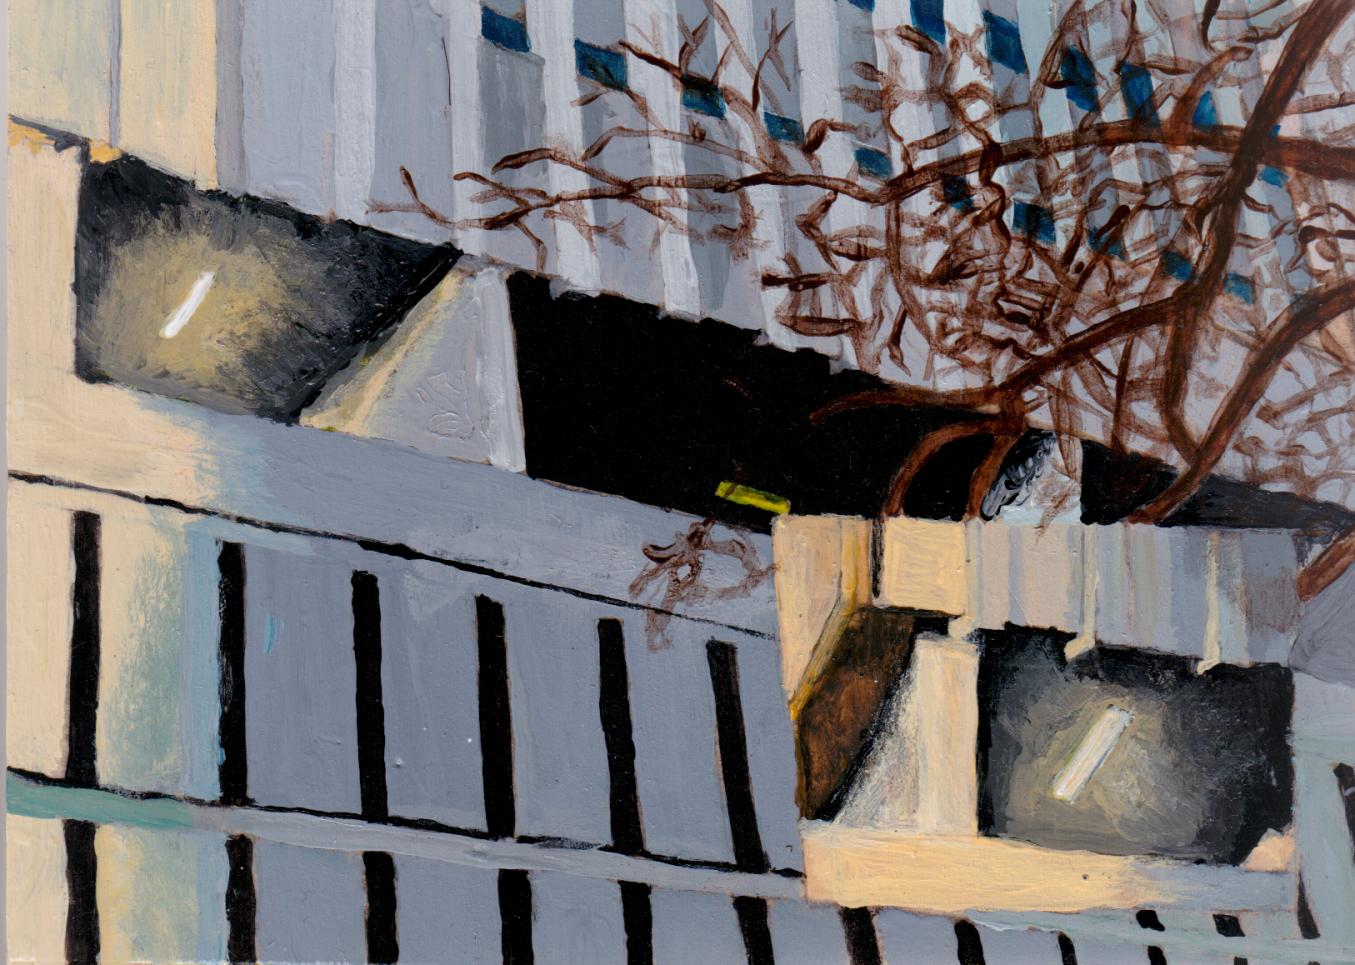 Lucinda_cityscape painting_01.jpg